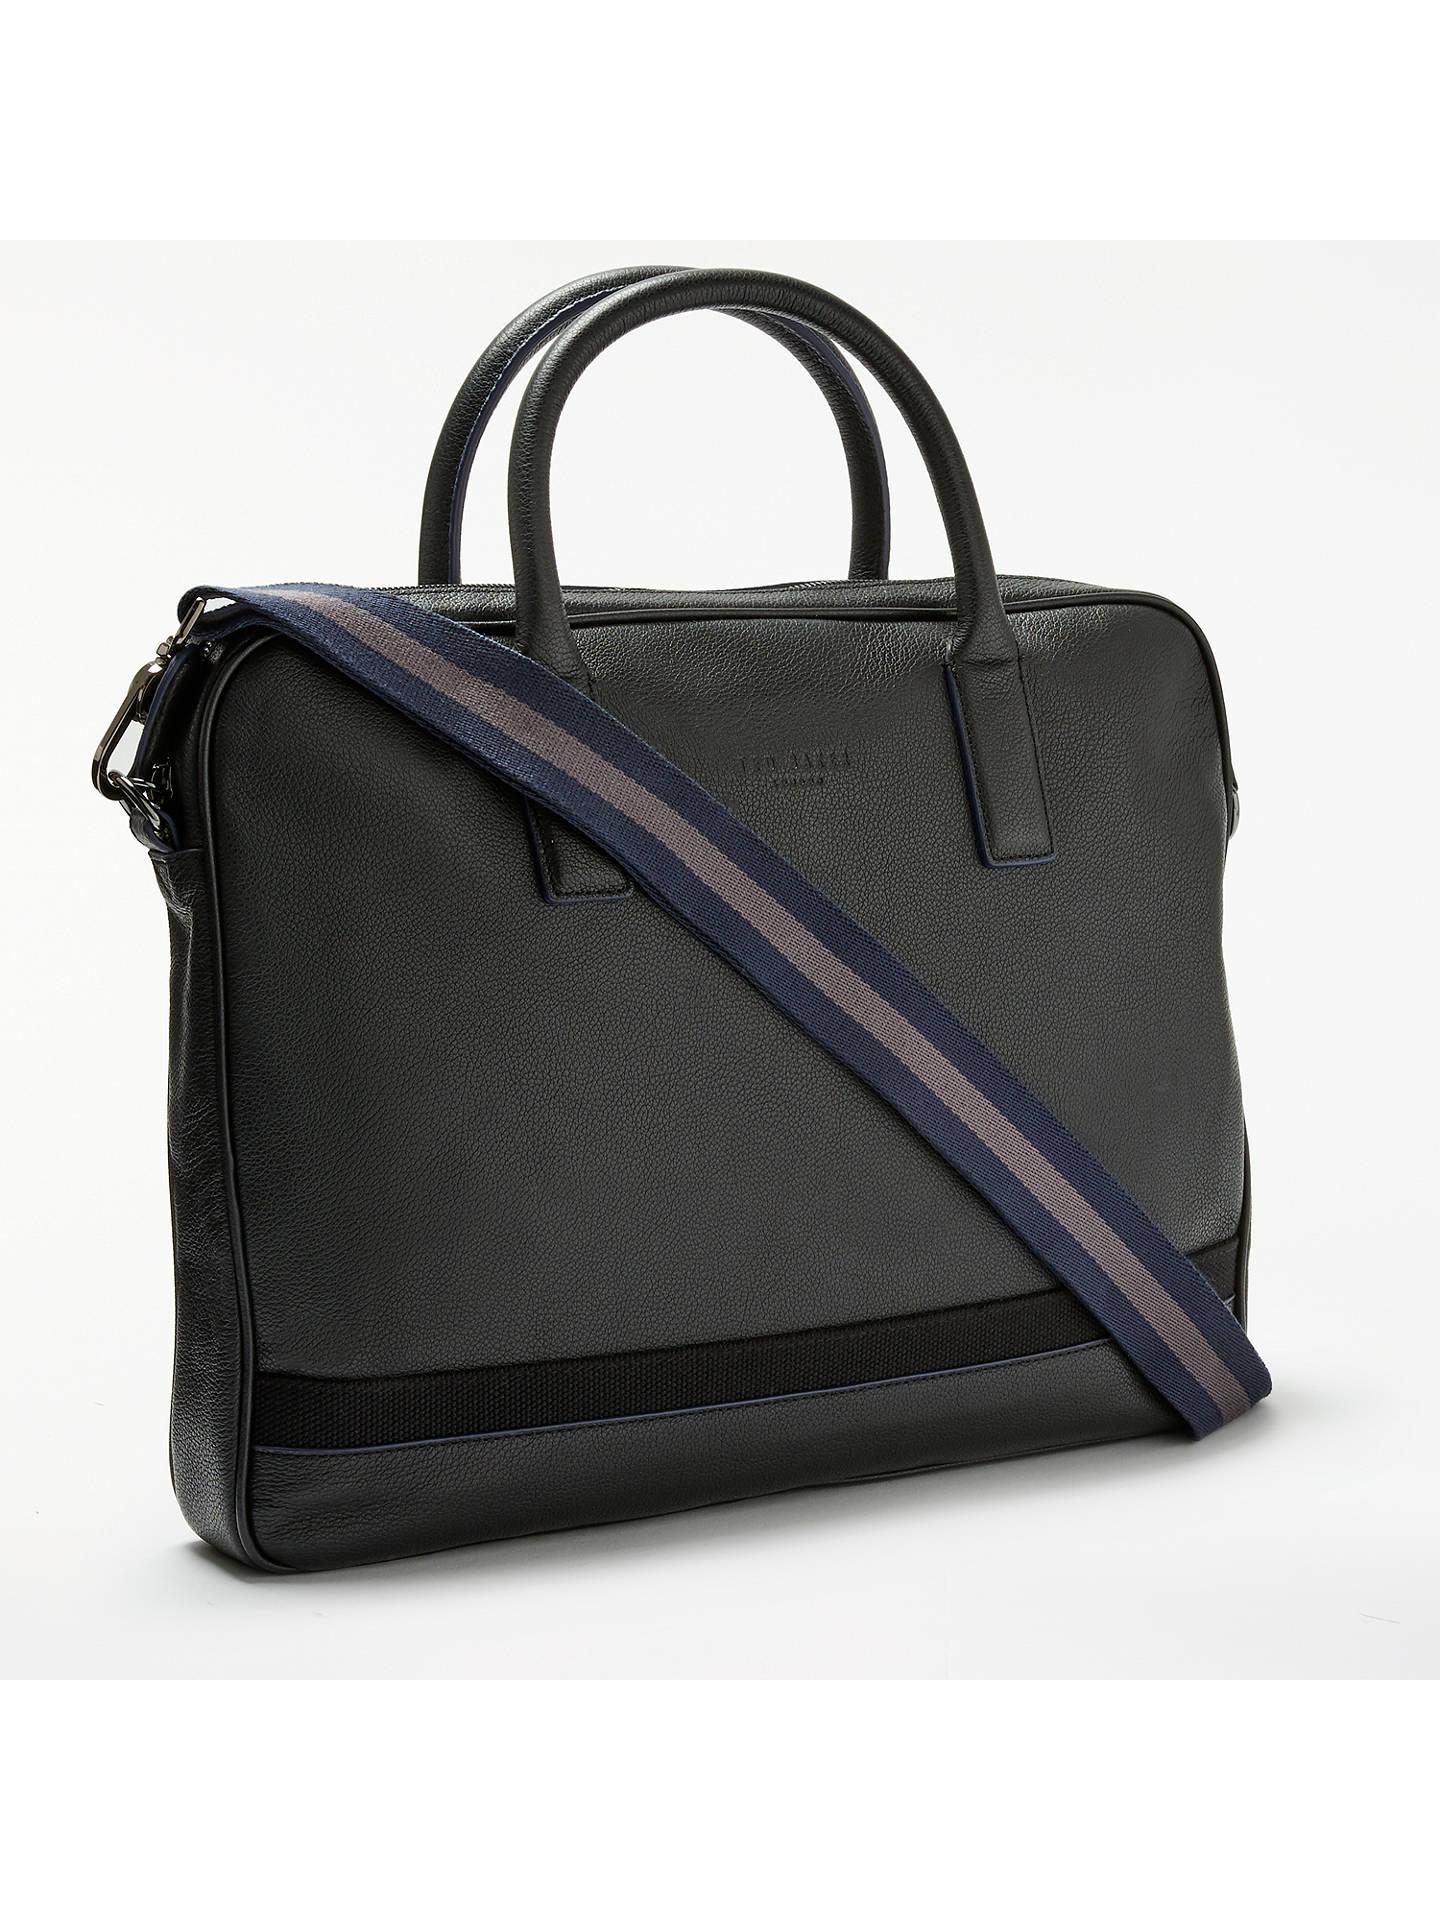 e1abed50d8 Buy Ted Baker Lowme Leather Document Bag, Black Online at johnlewis.com ...